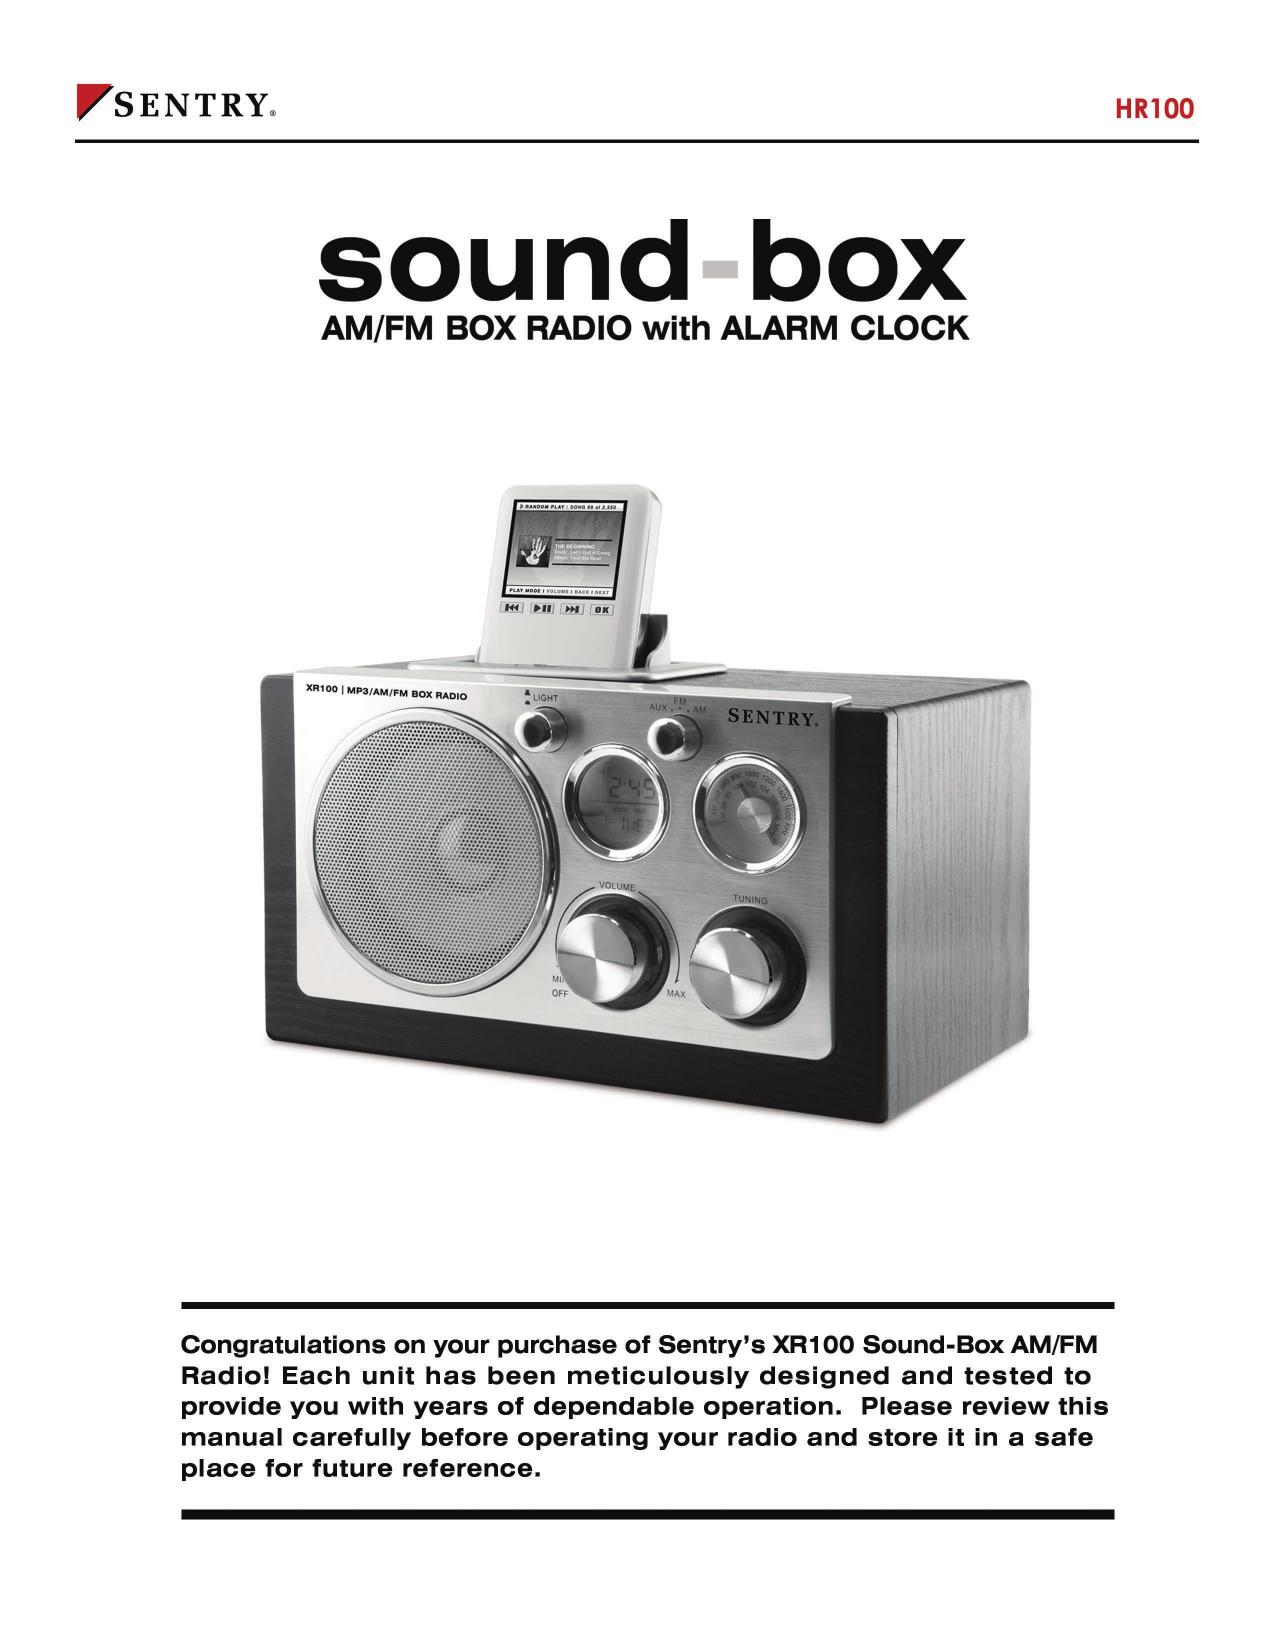 pdf for Sentry Radio XR100 manual